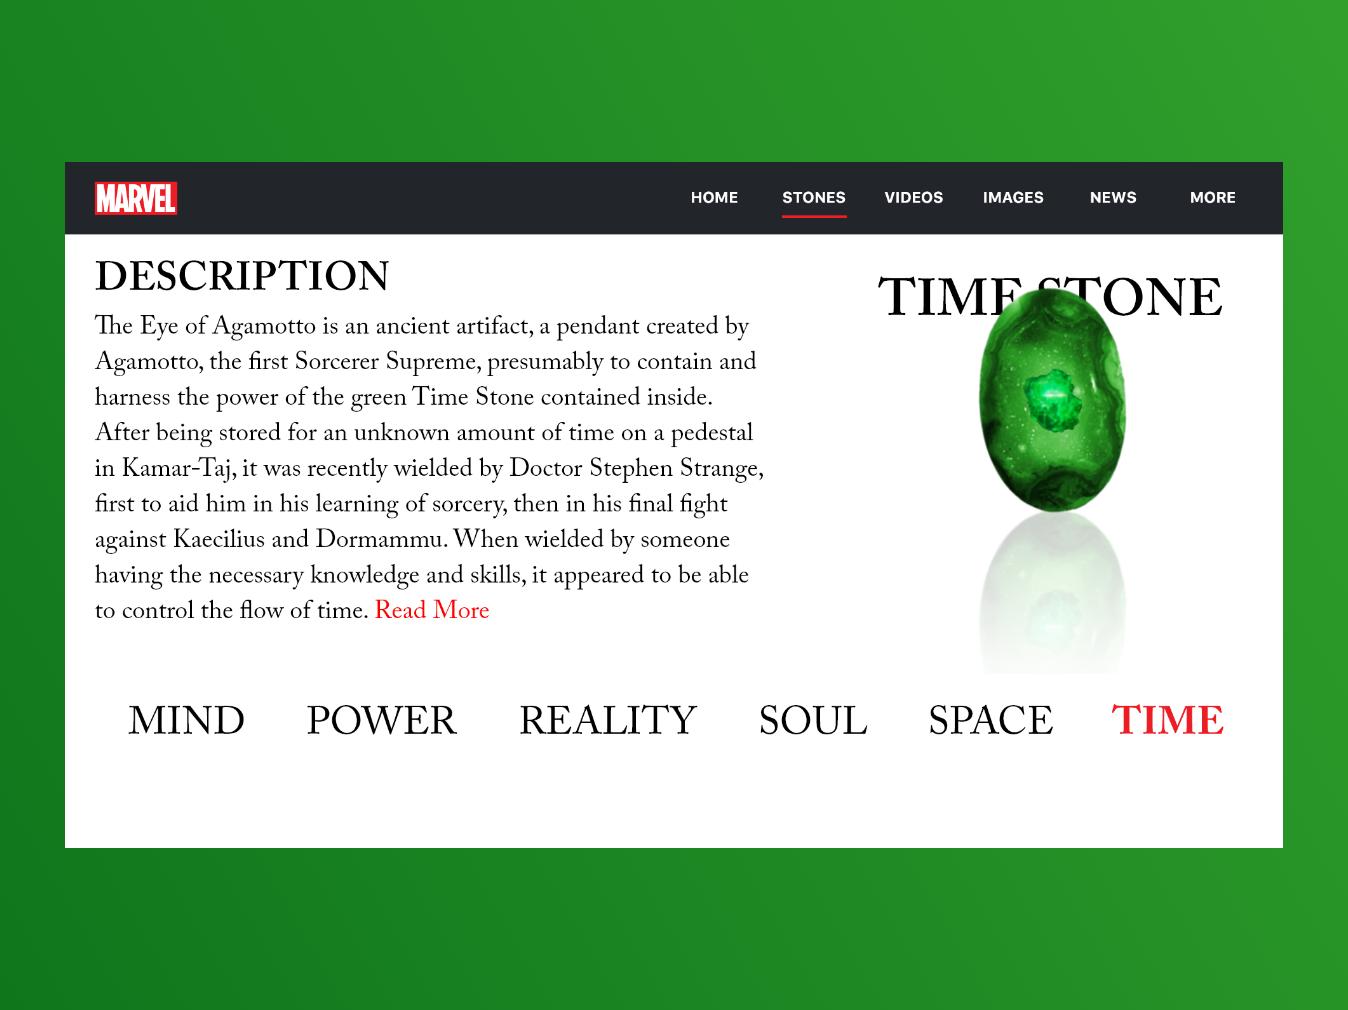 The Time Stone | Marvel Web Design | Adobe XD web design interface design inspiration experience design prototype illustration minimal interaction madewithxd design adobe xd ui